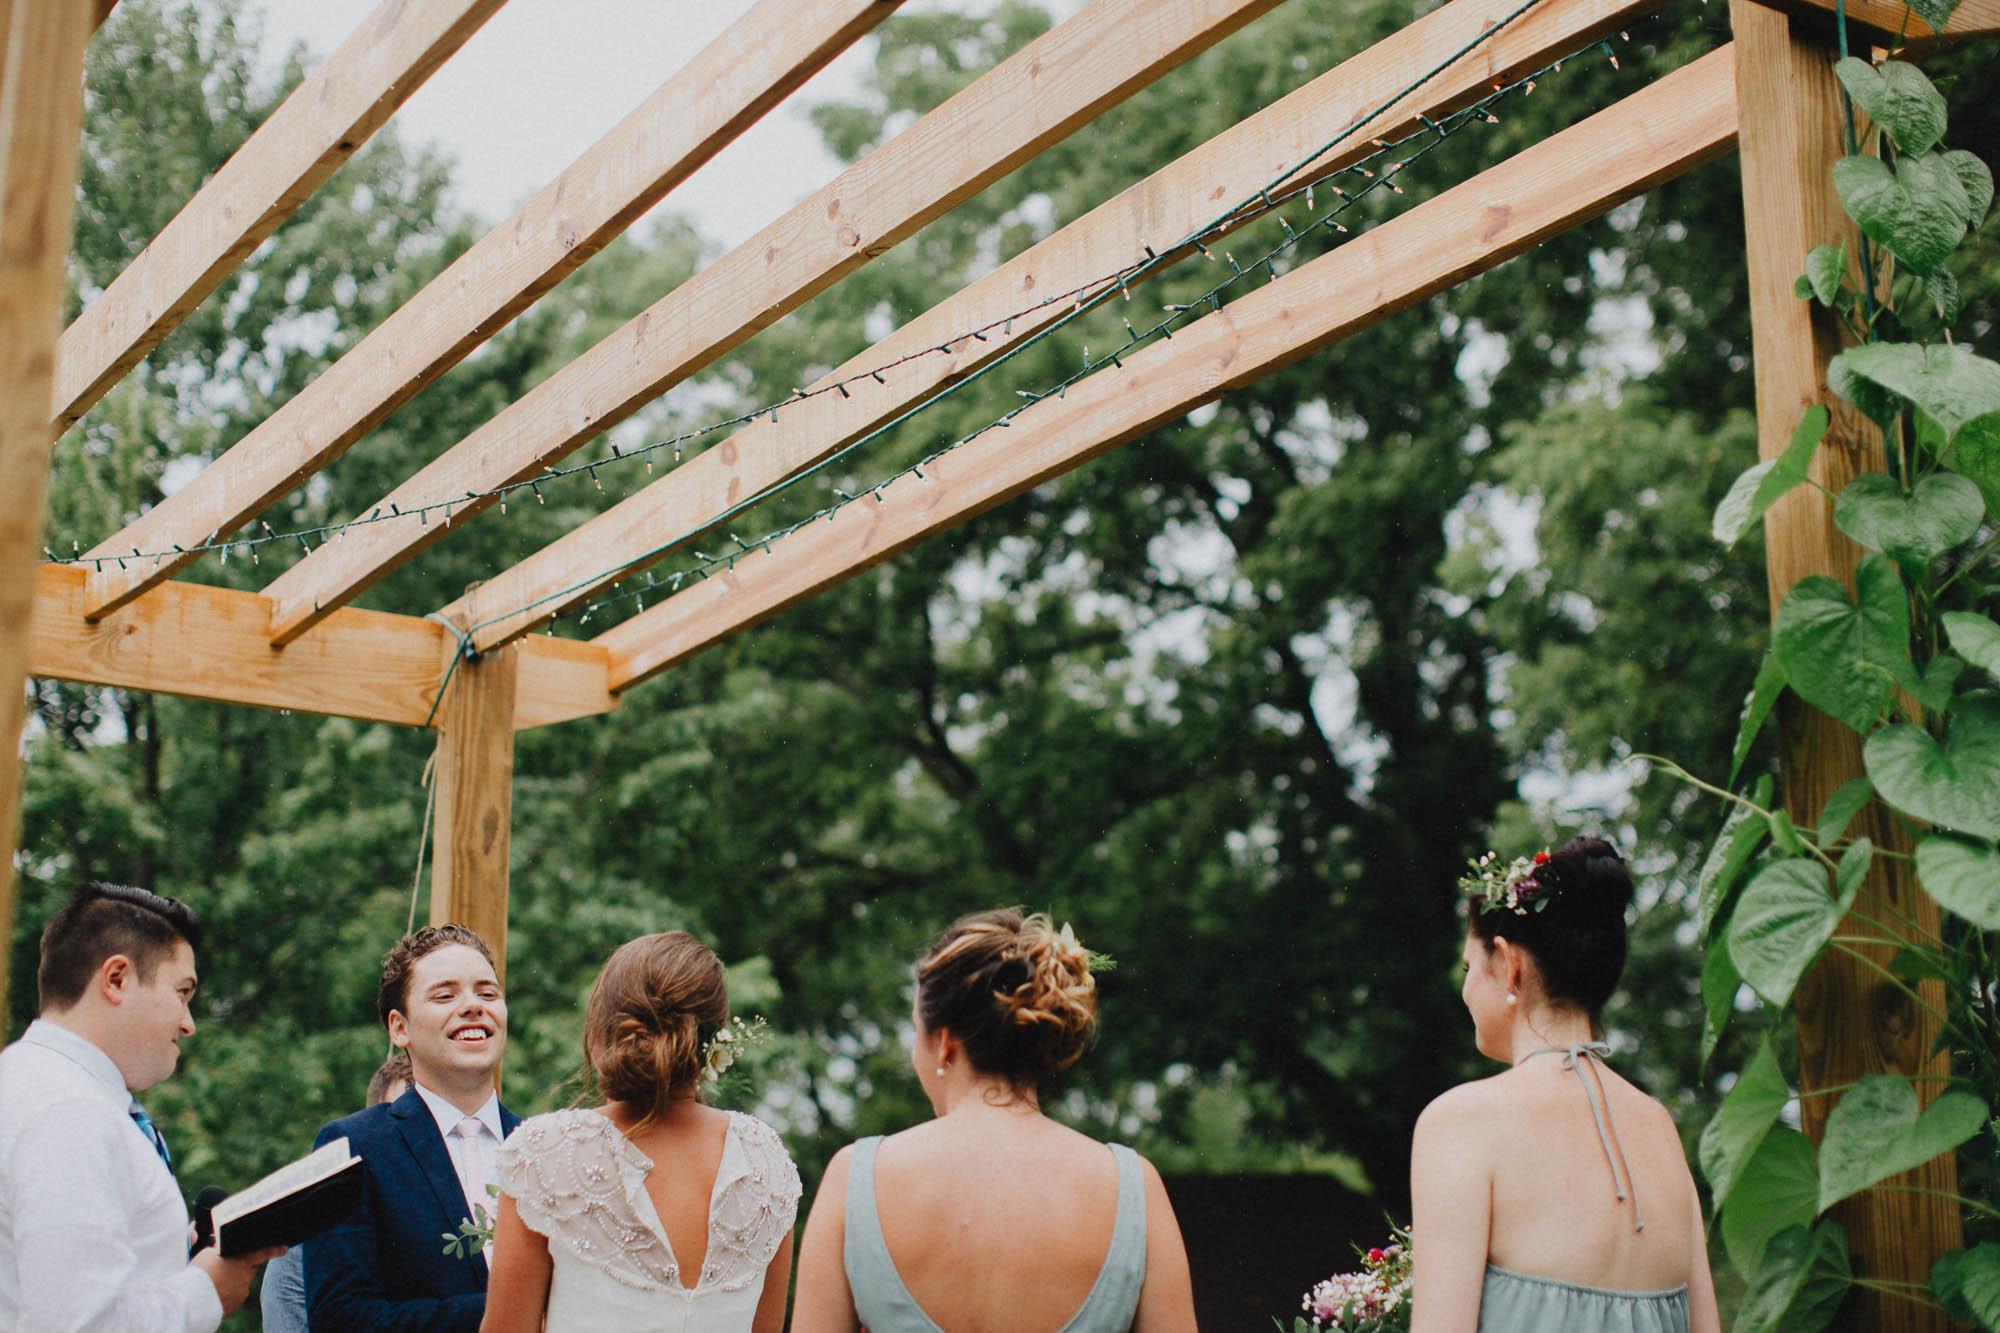 Leah-Graham-Michigan-Outdoor-DIY-Wedding-051@2x.jpg